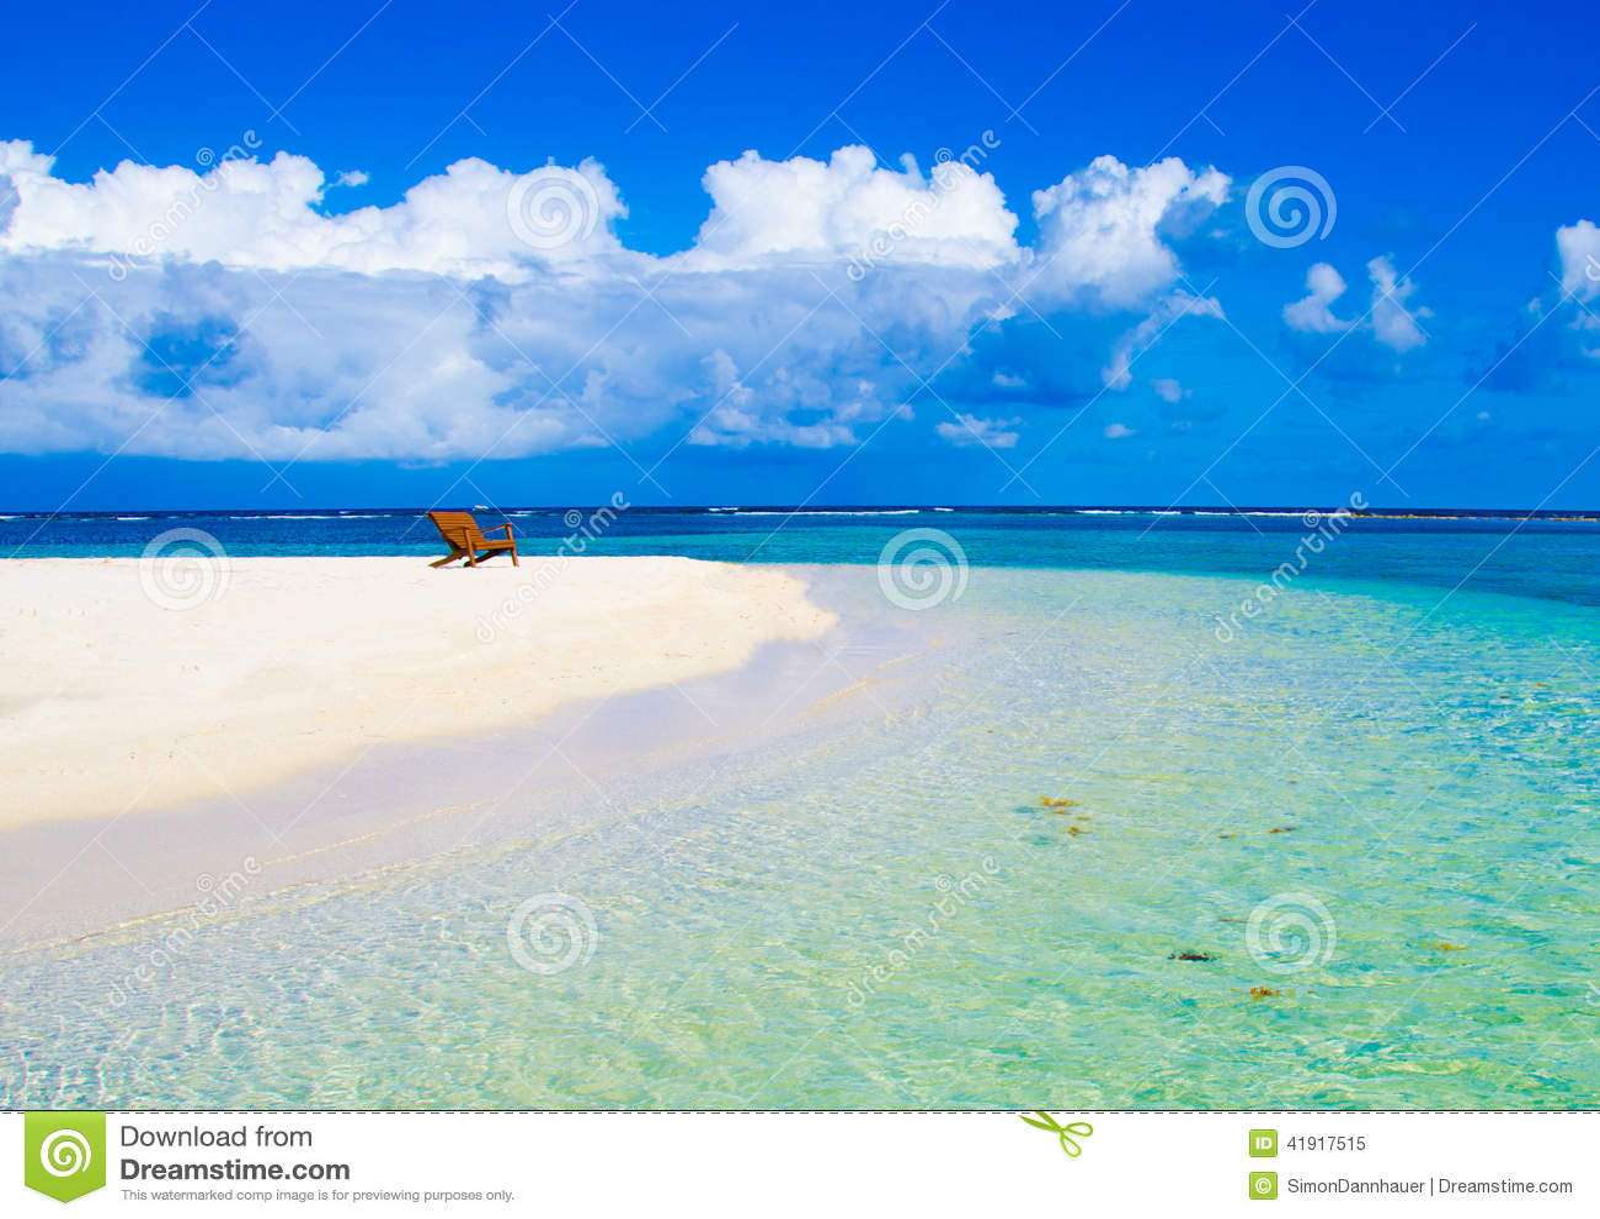 Relaxing on Chair - beautiful island